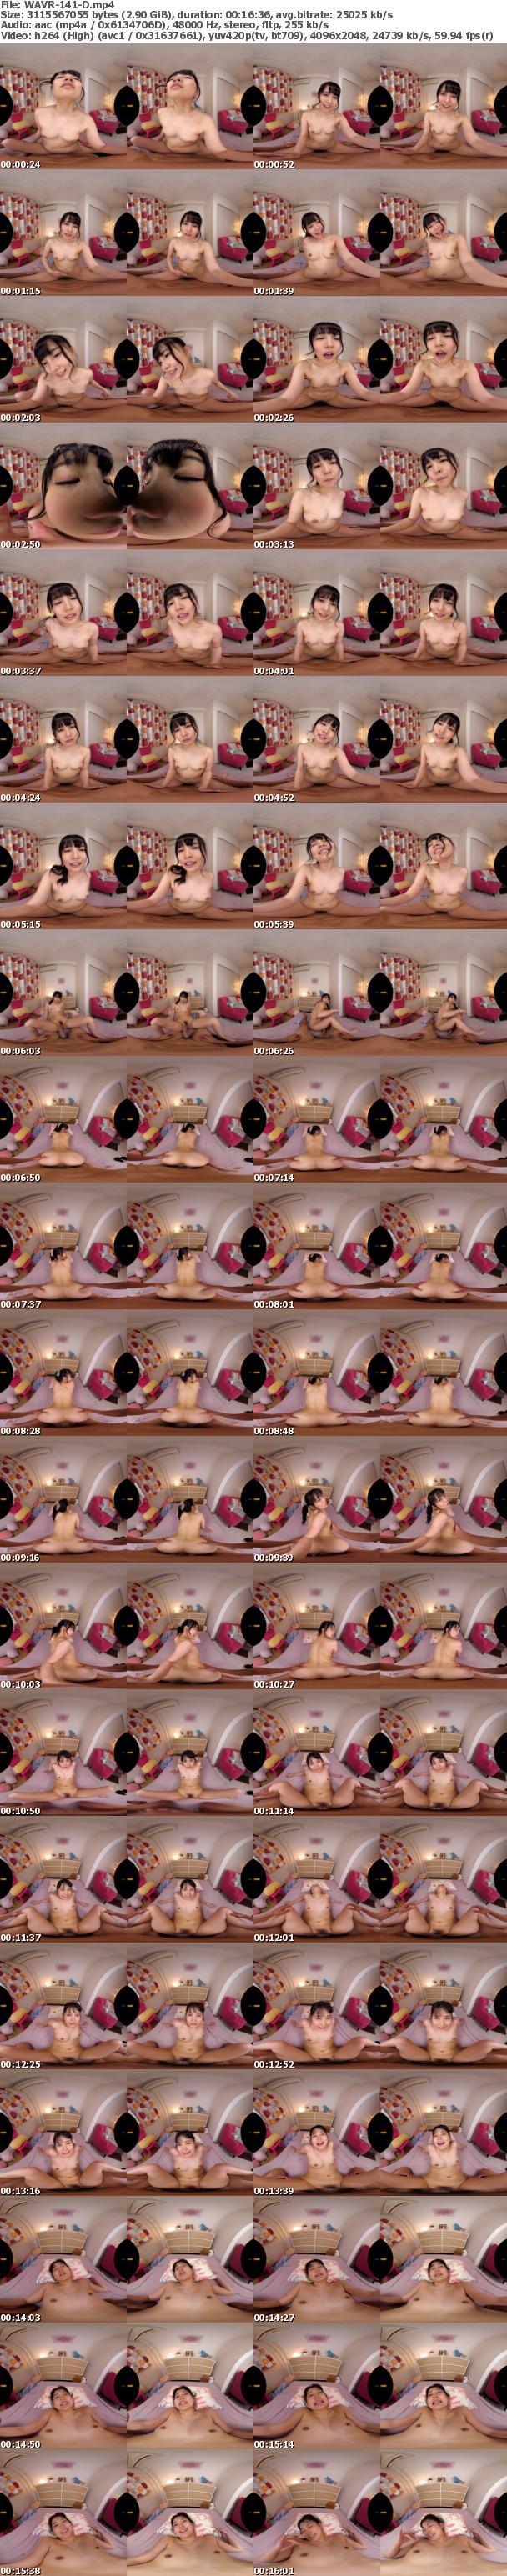 (VR) WAVR-141 【同時イキ体験VR】かわい~いカノジョ・枢木あおいと「カウントダウンで何回も一緒にイこっ!!」